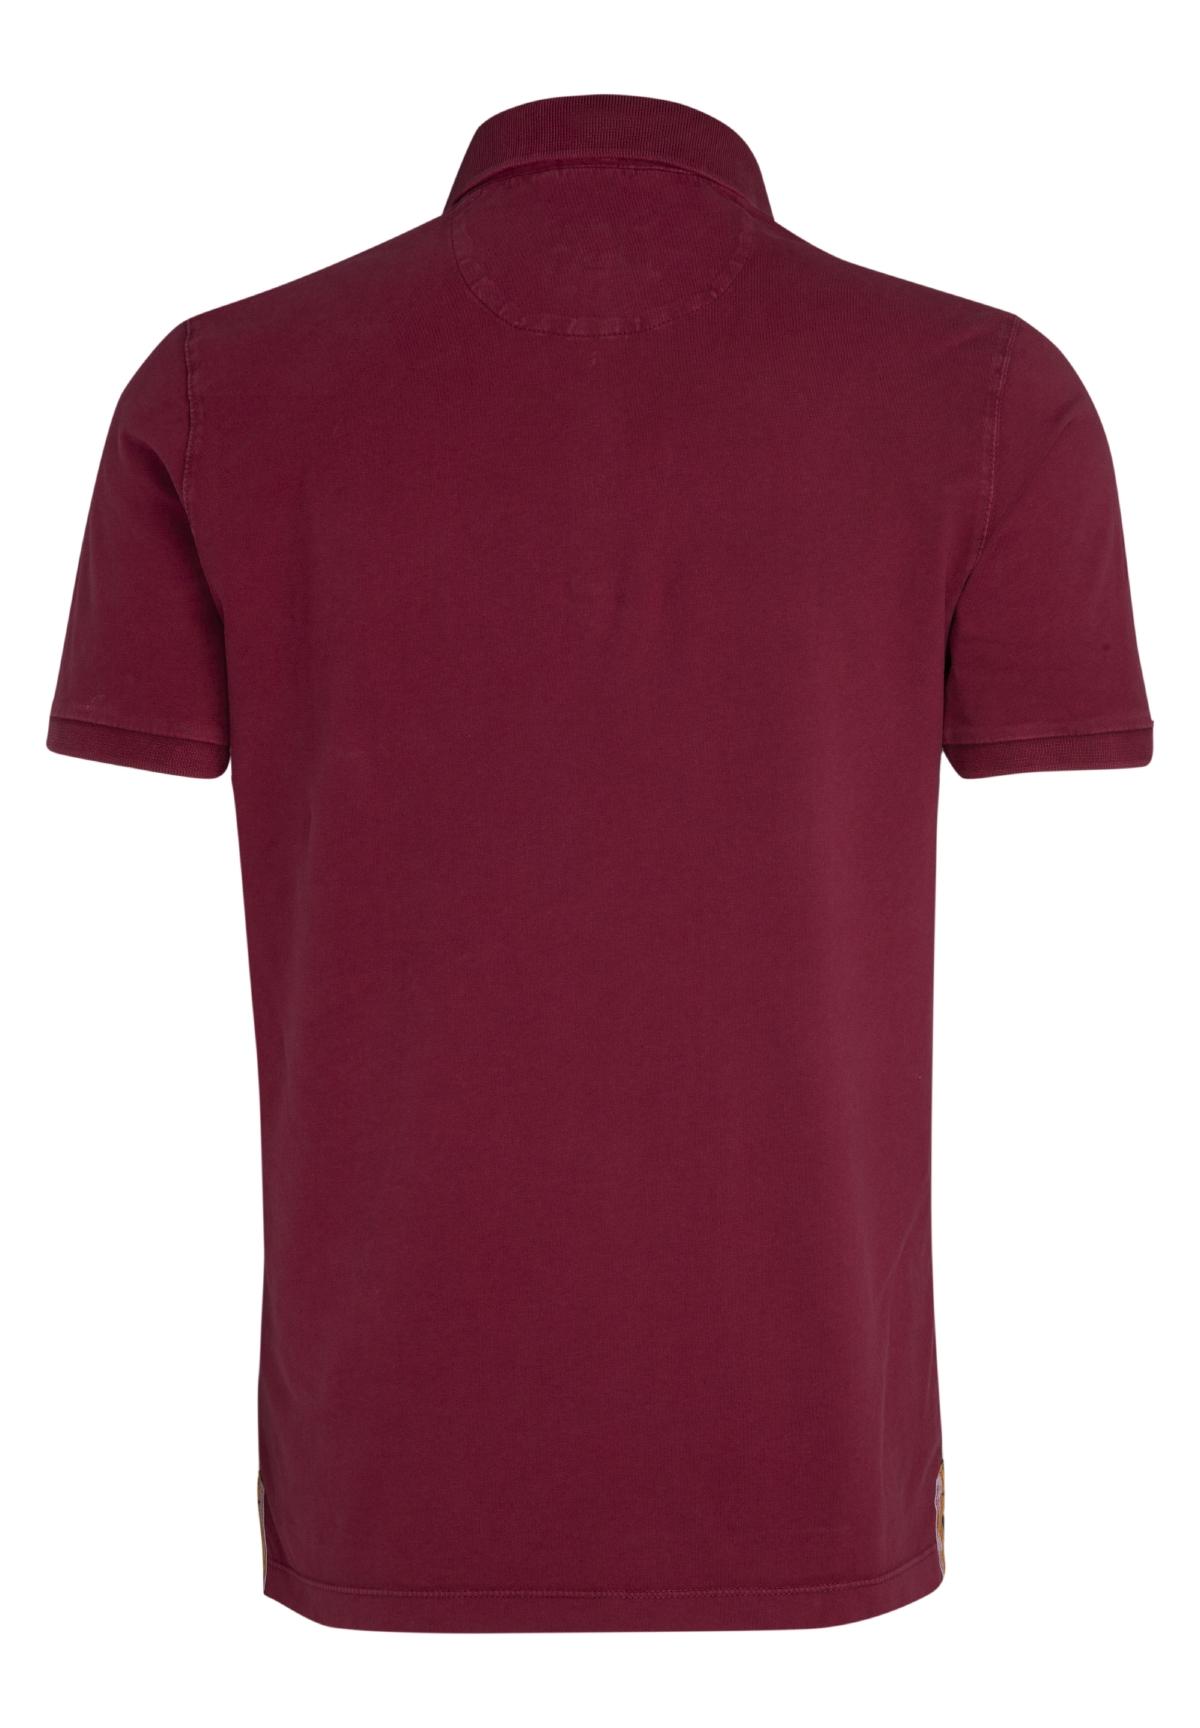 Camel-Active-Herren-Shirt-Poloshirt-Pique-Regular-Fit-NEU Indexbild 58